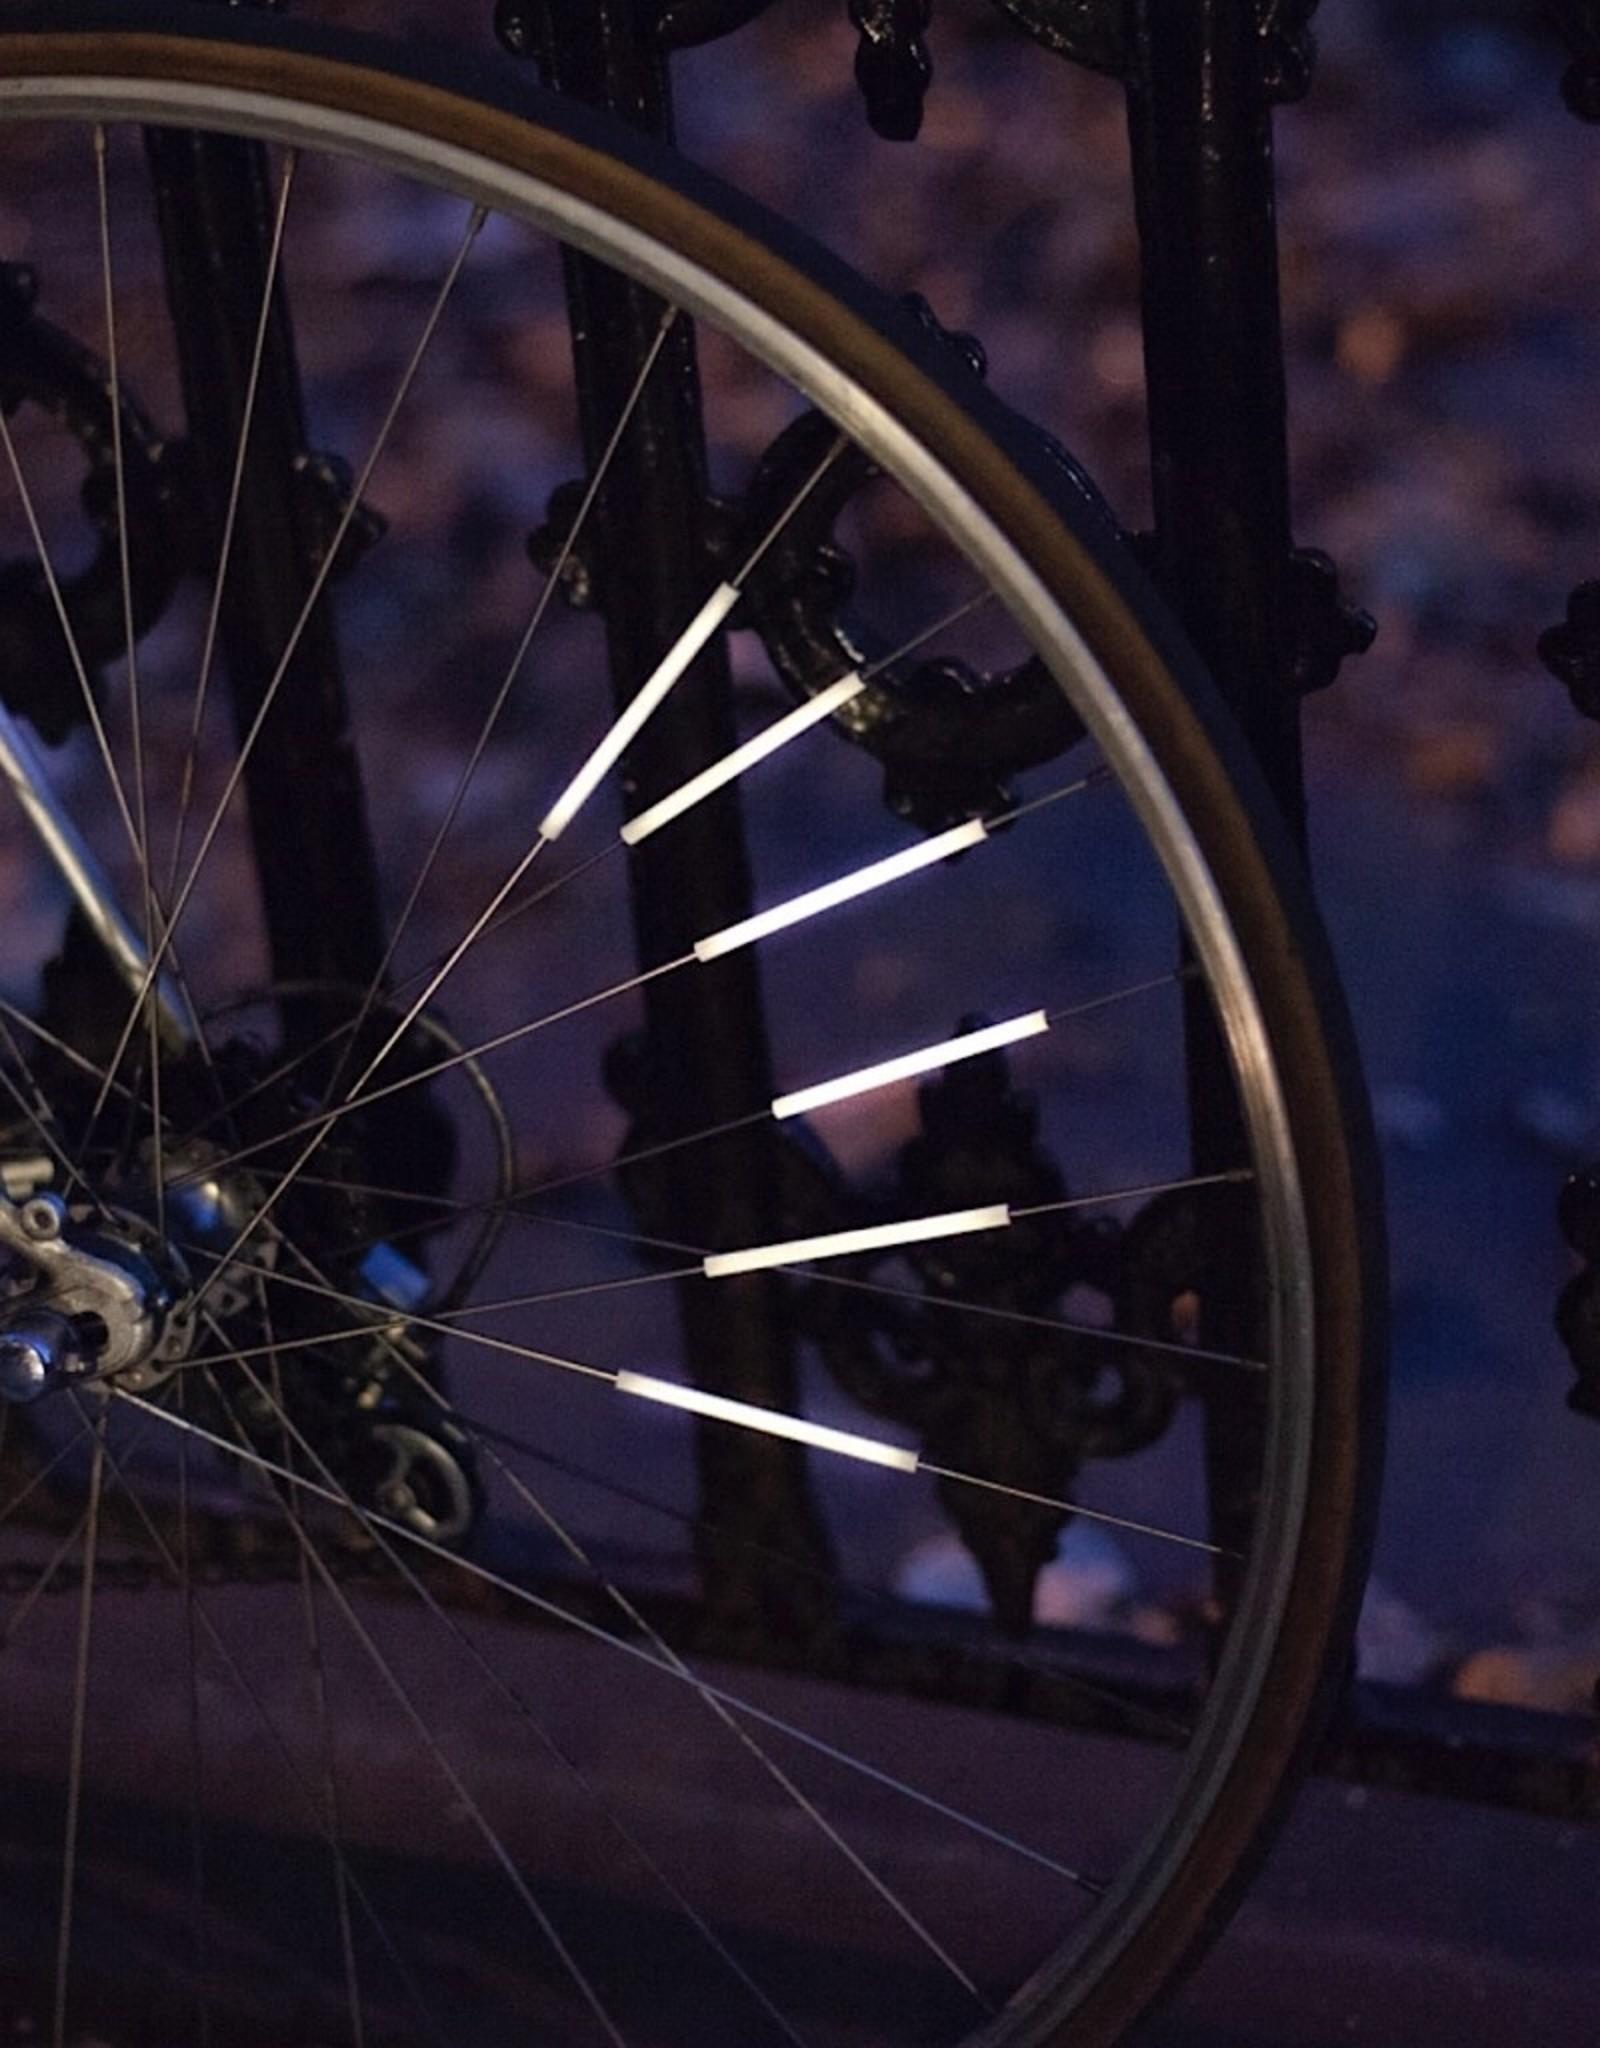 Kikkerland Bike Spoke Reflector Set of 12